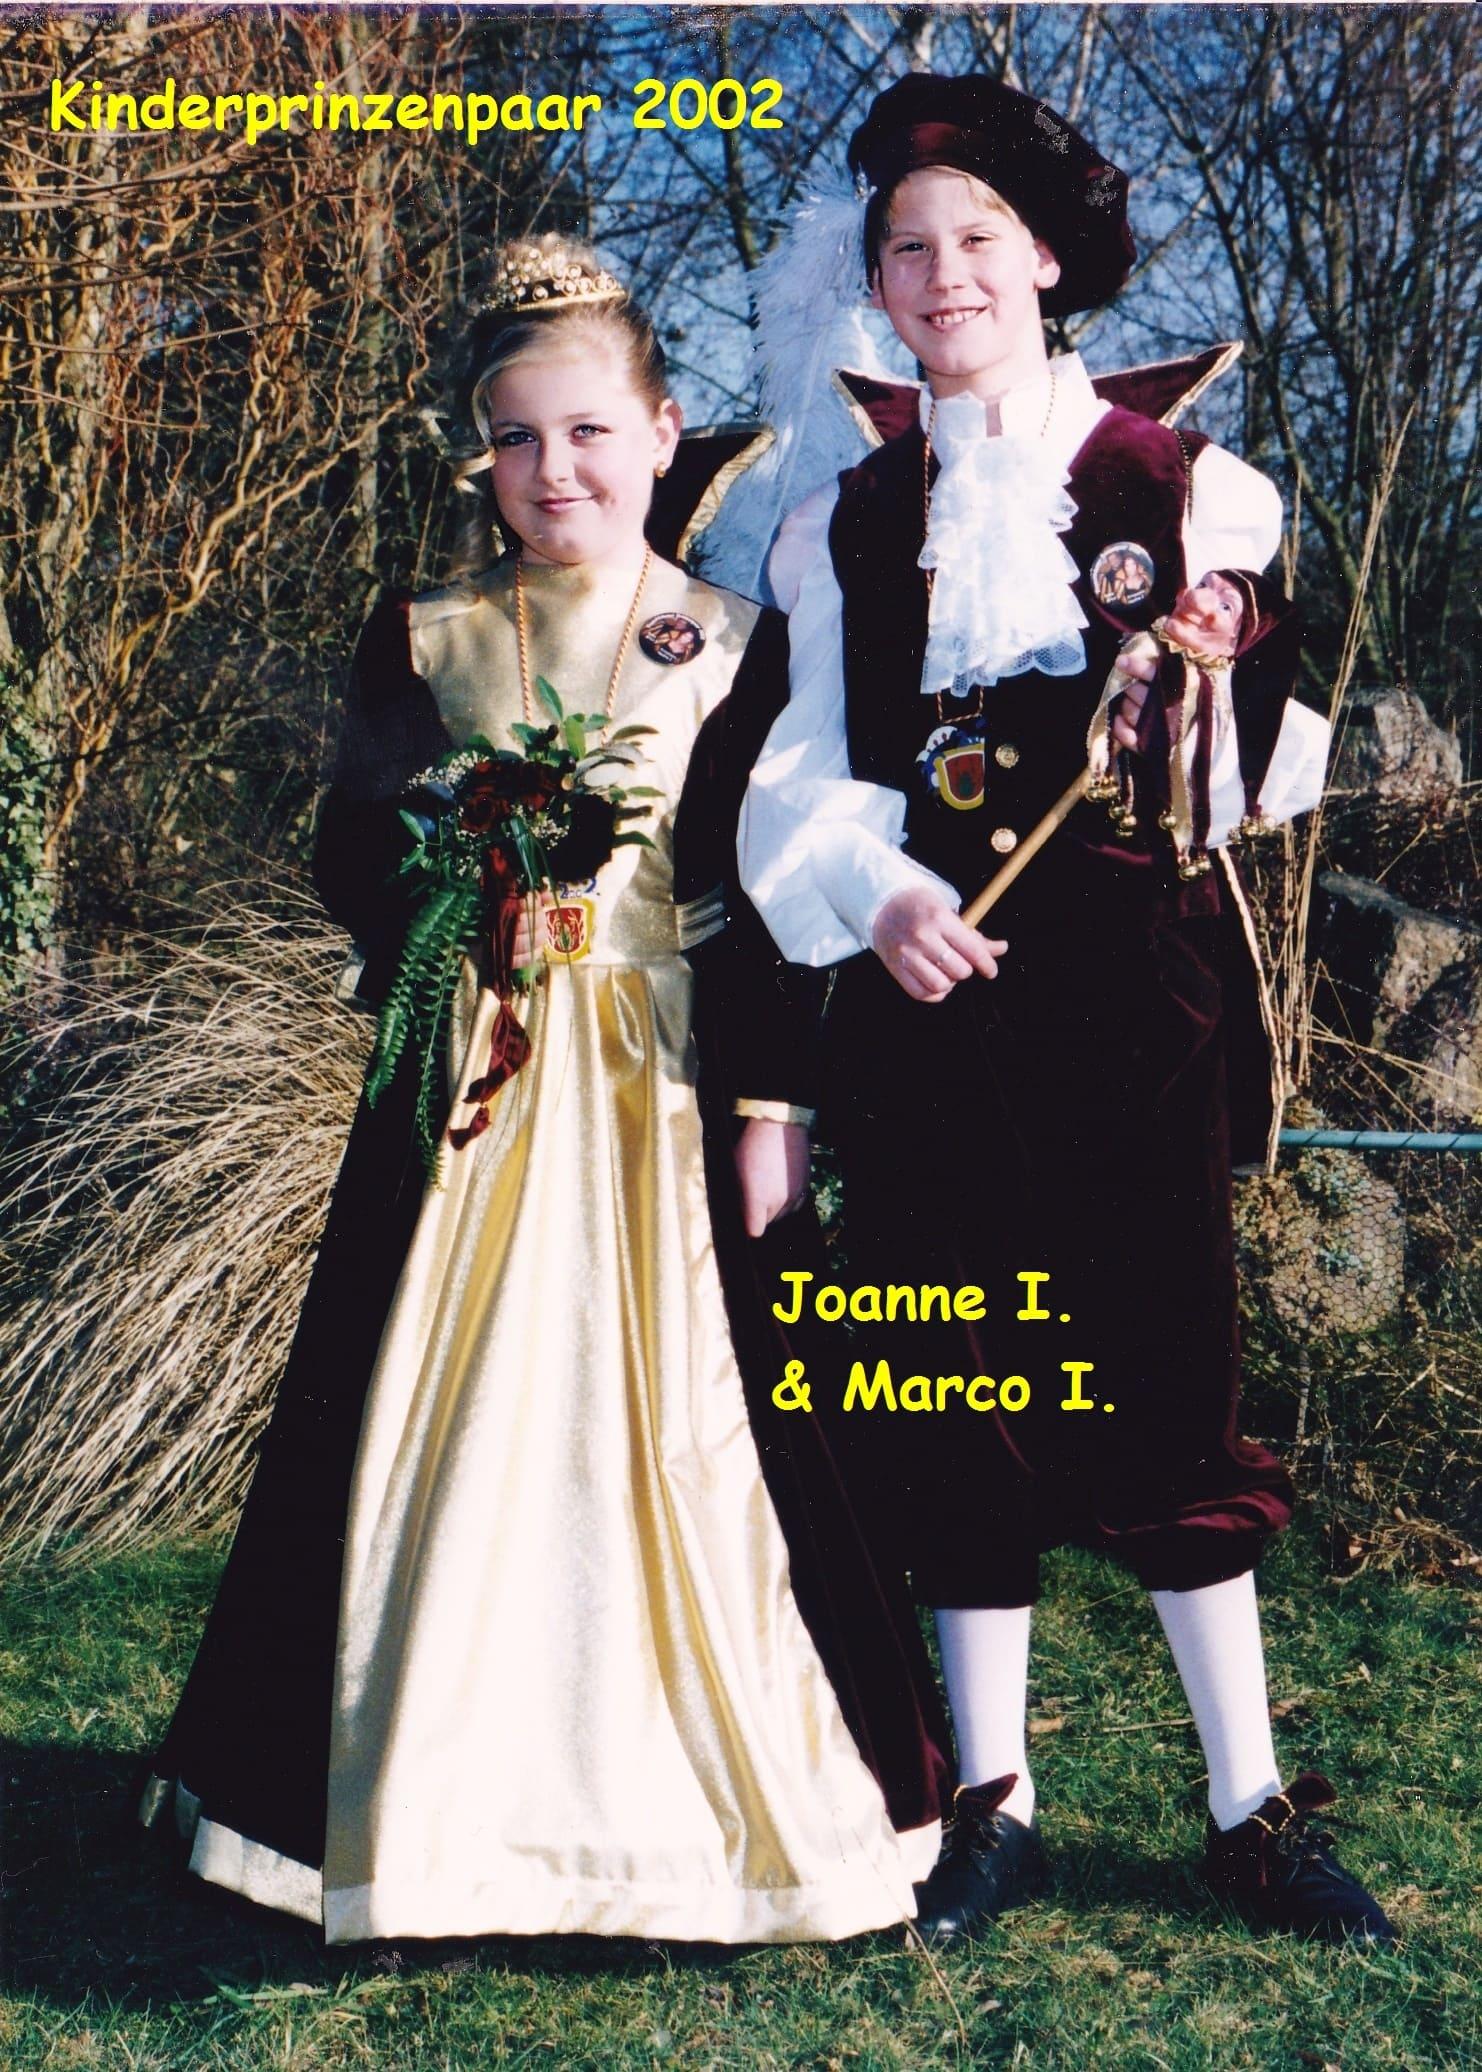 2002 Joanne Blum & Marco Haus